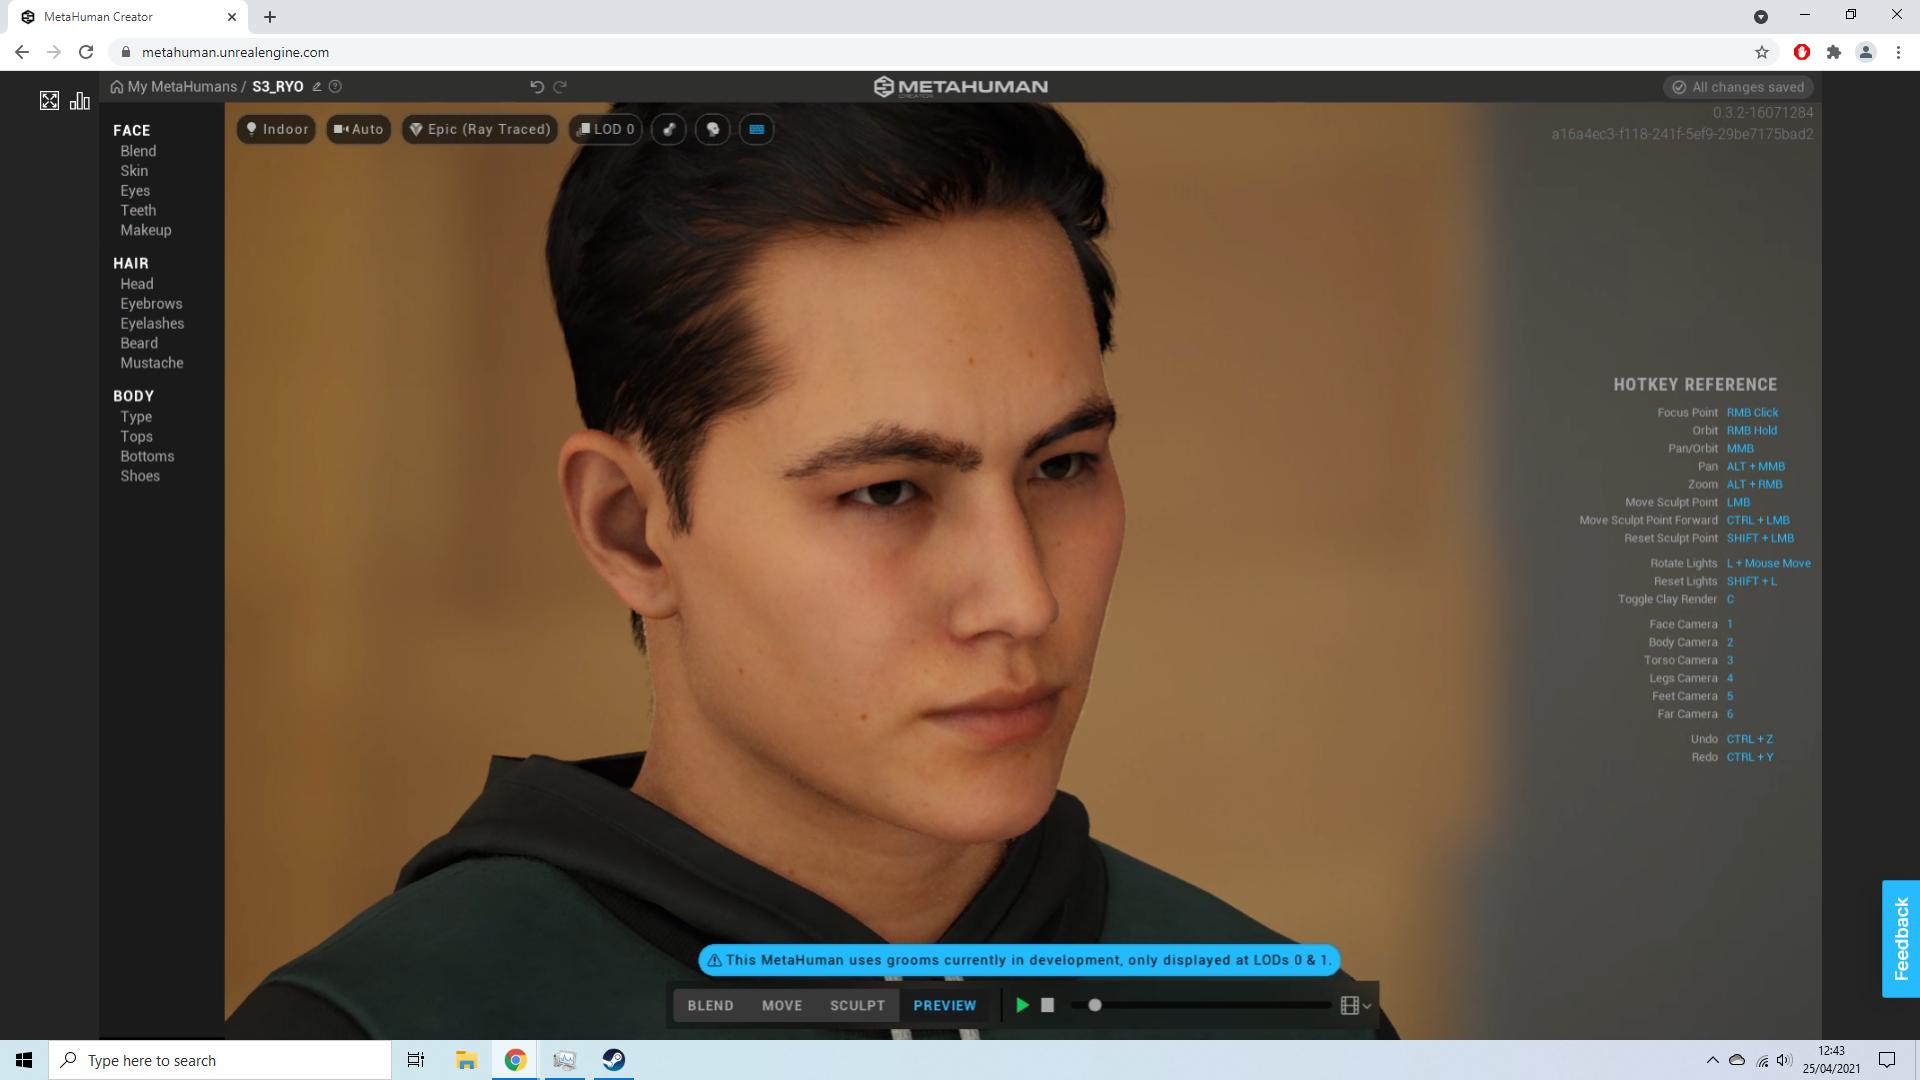 desktopscreenshot2021u2kbb.png